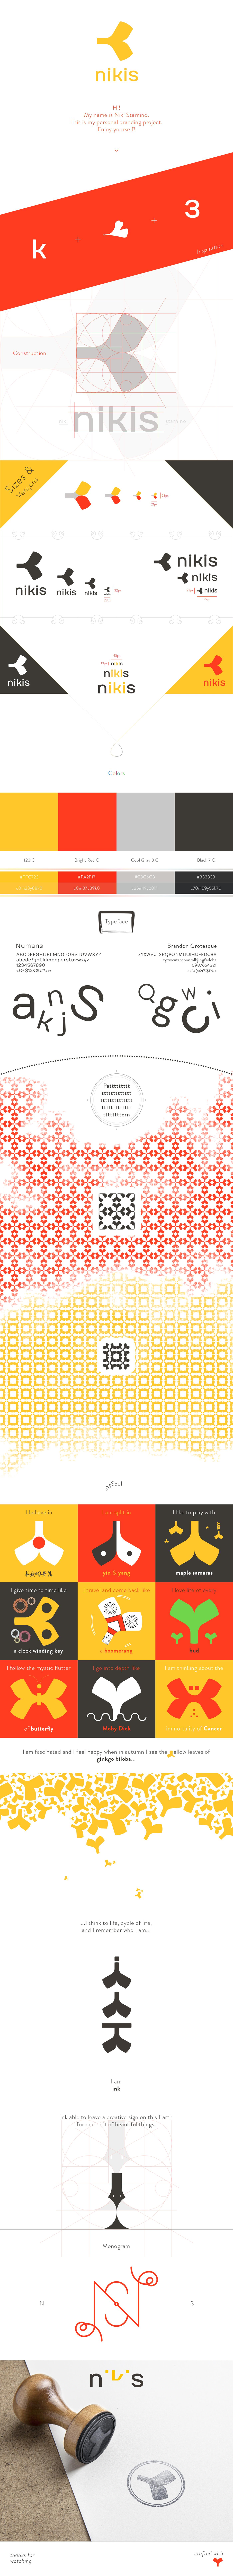 logo brand Logotype sign mark scroll visual identity idea symbol Project nikis niki starnino logogram Creativity